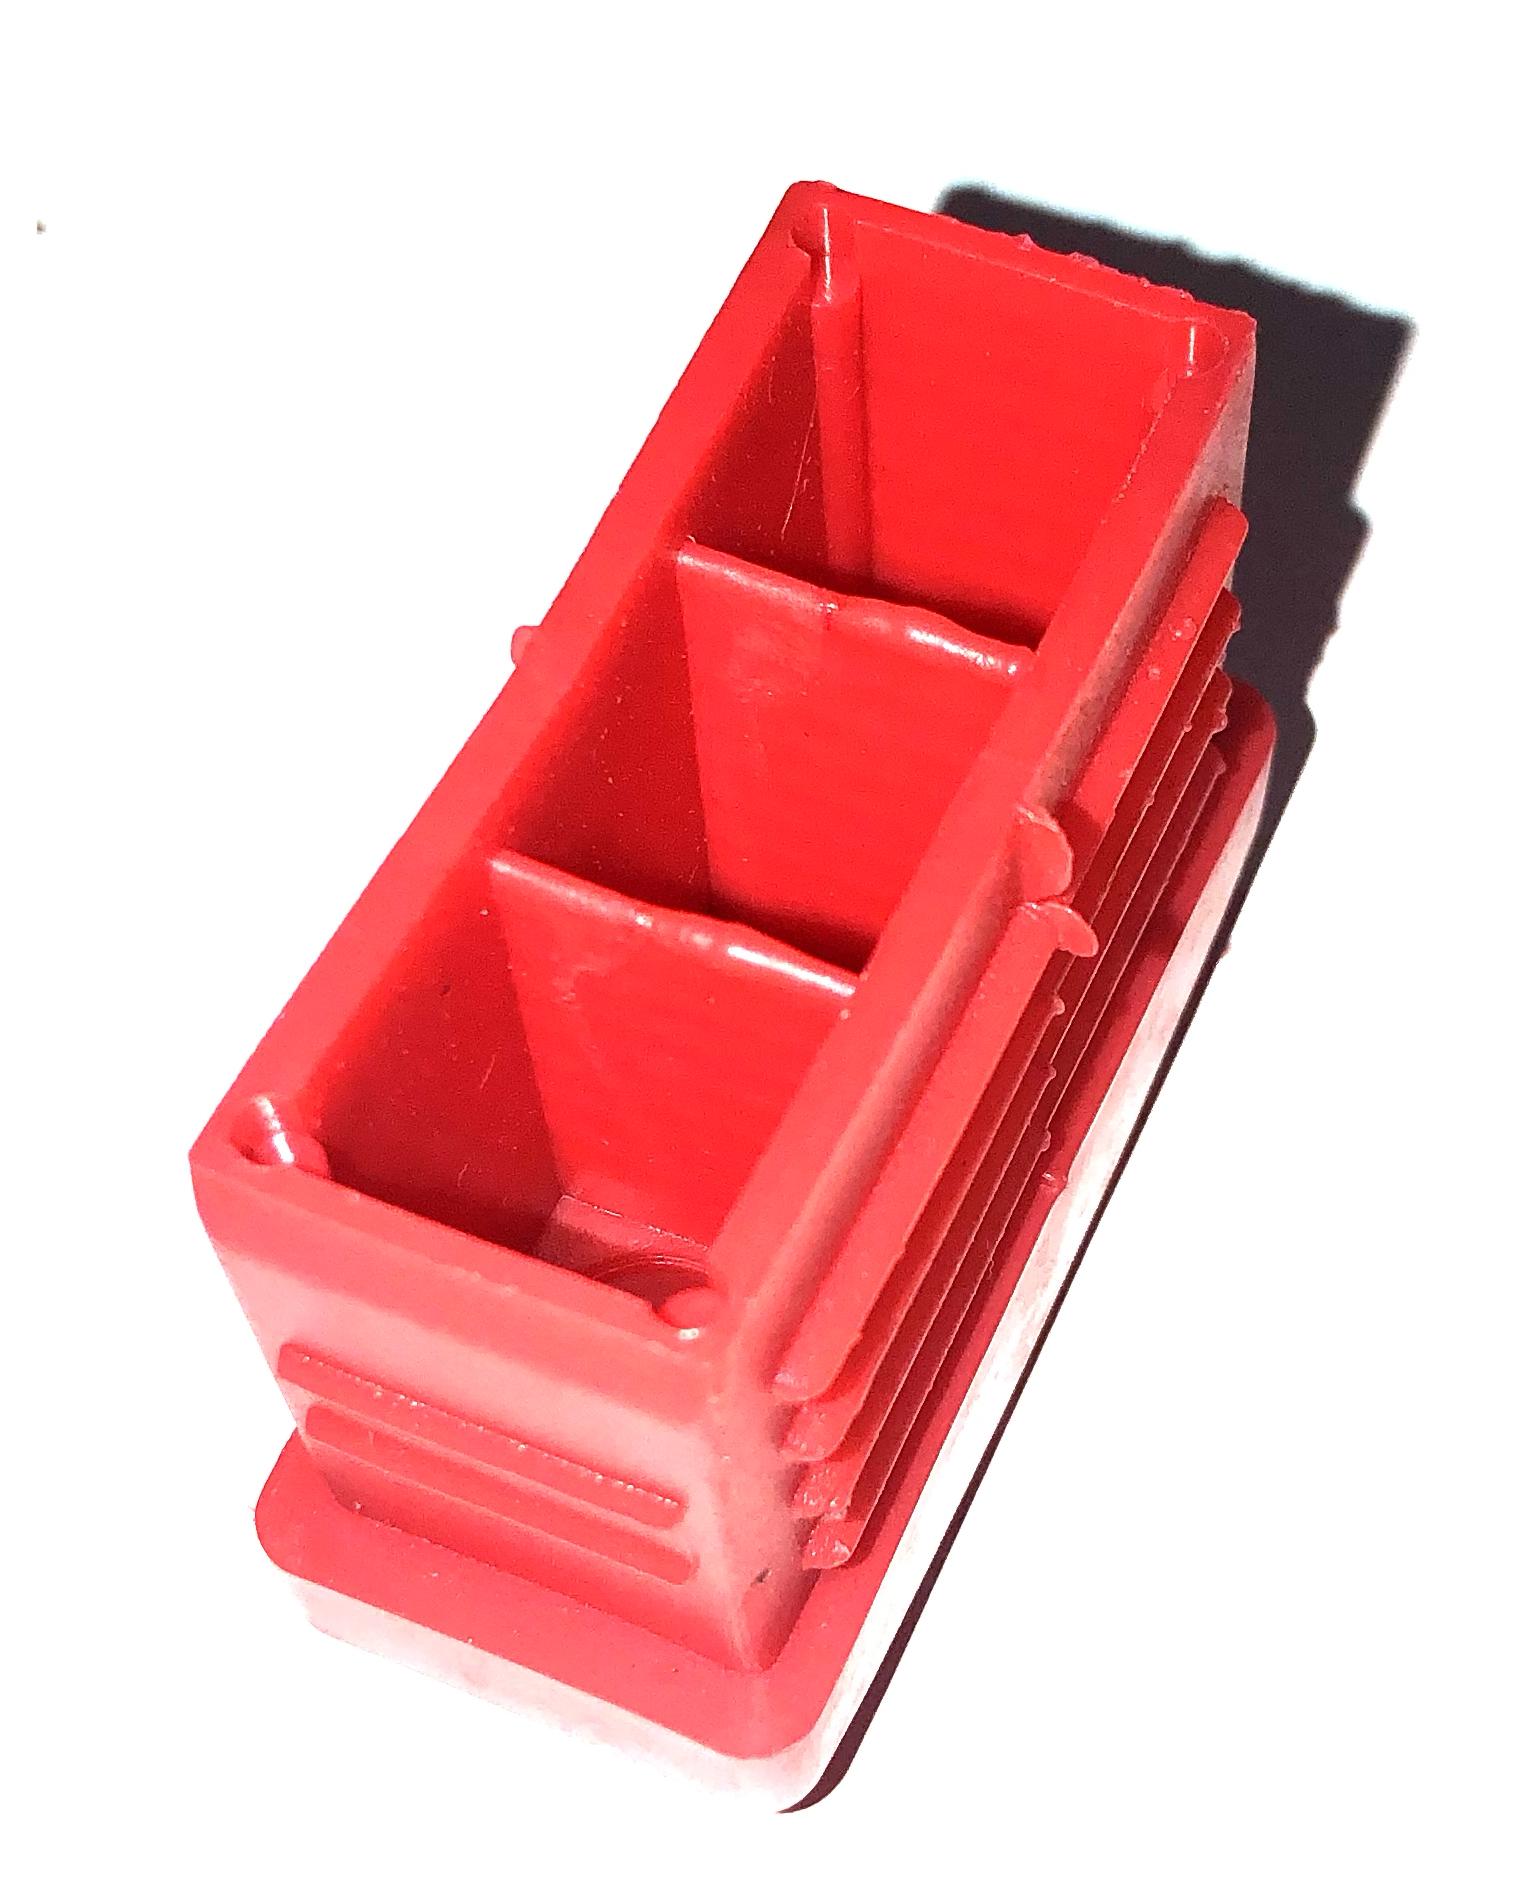 Part.001 Insteekdop rood voor binnenladder rood onderkant bigone